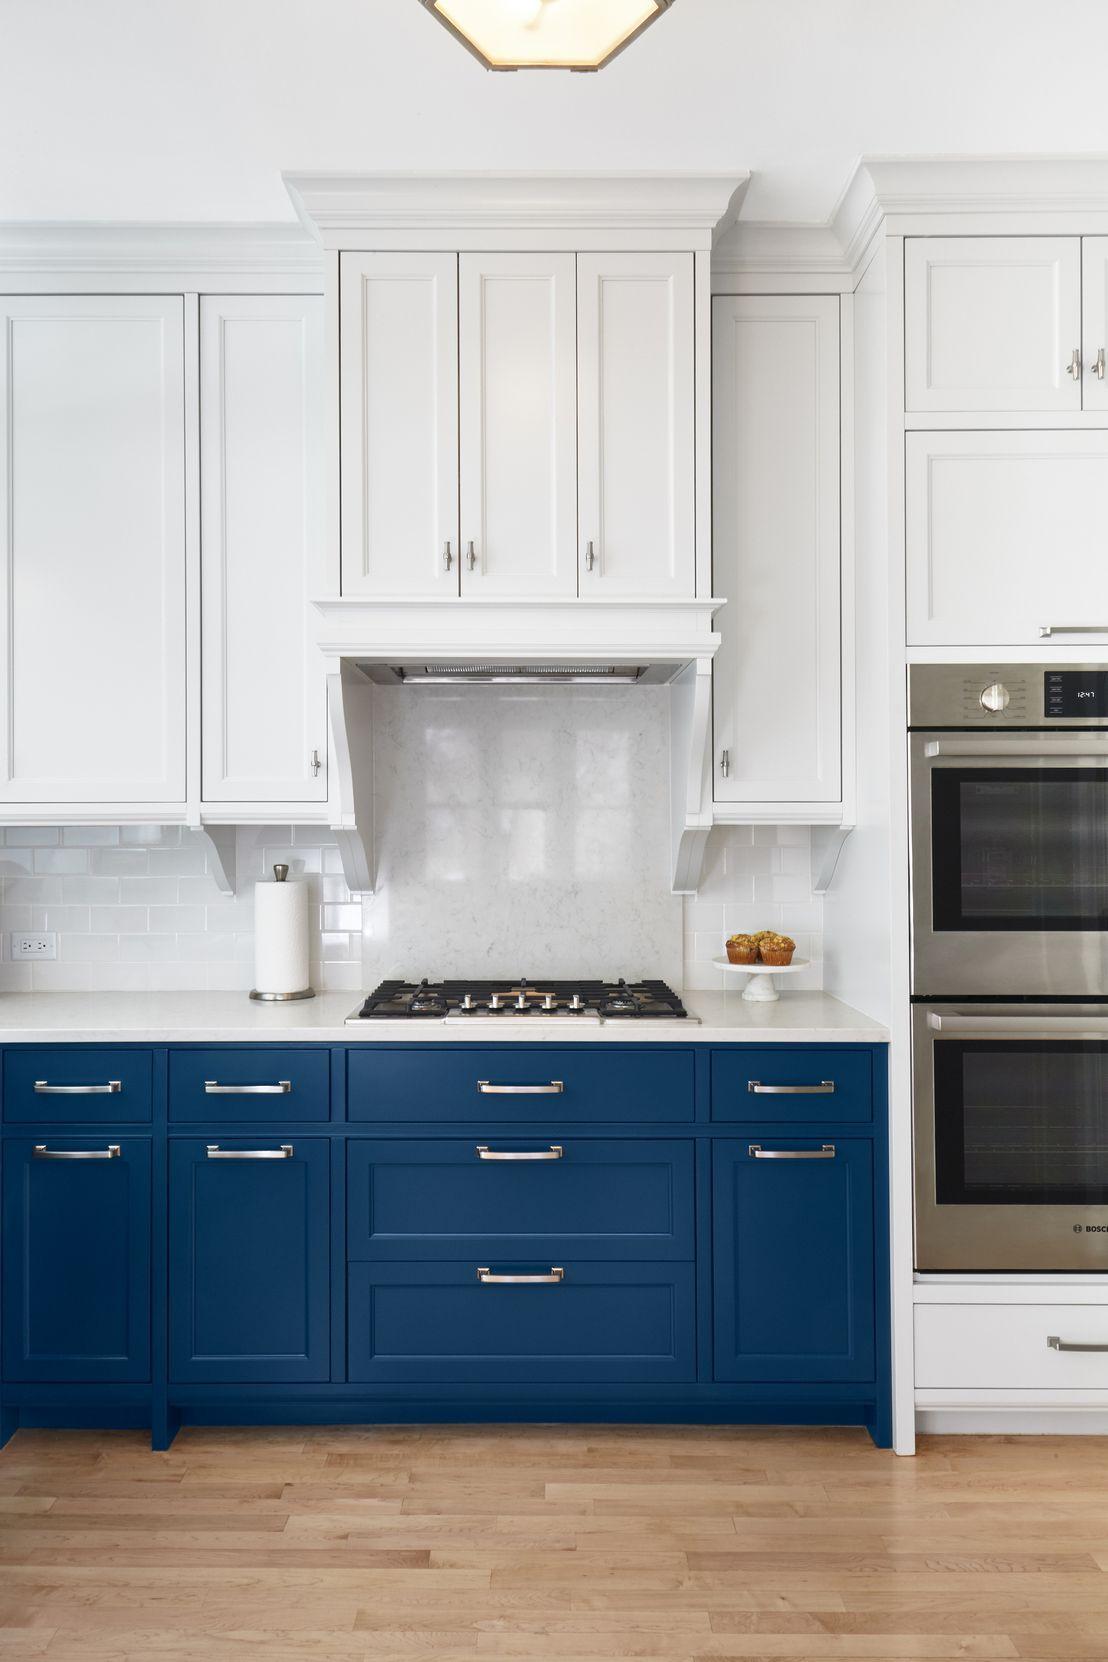 28 Stylish Kitchens with Concealed Range Hoods